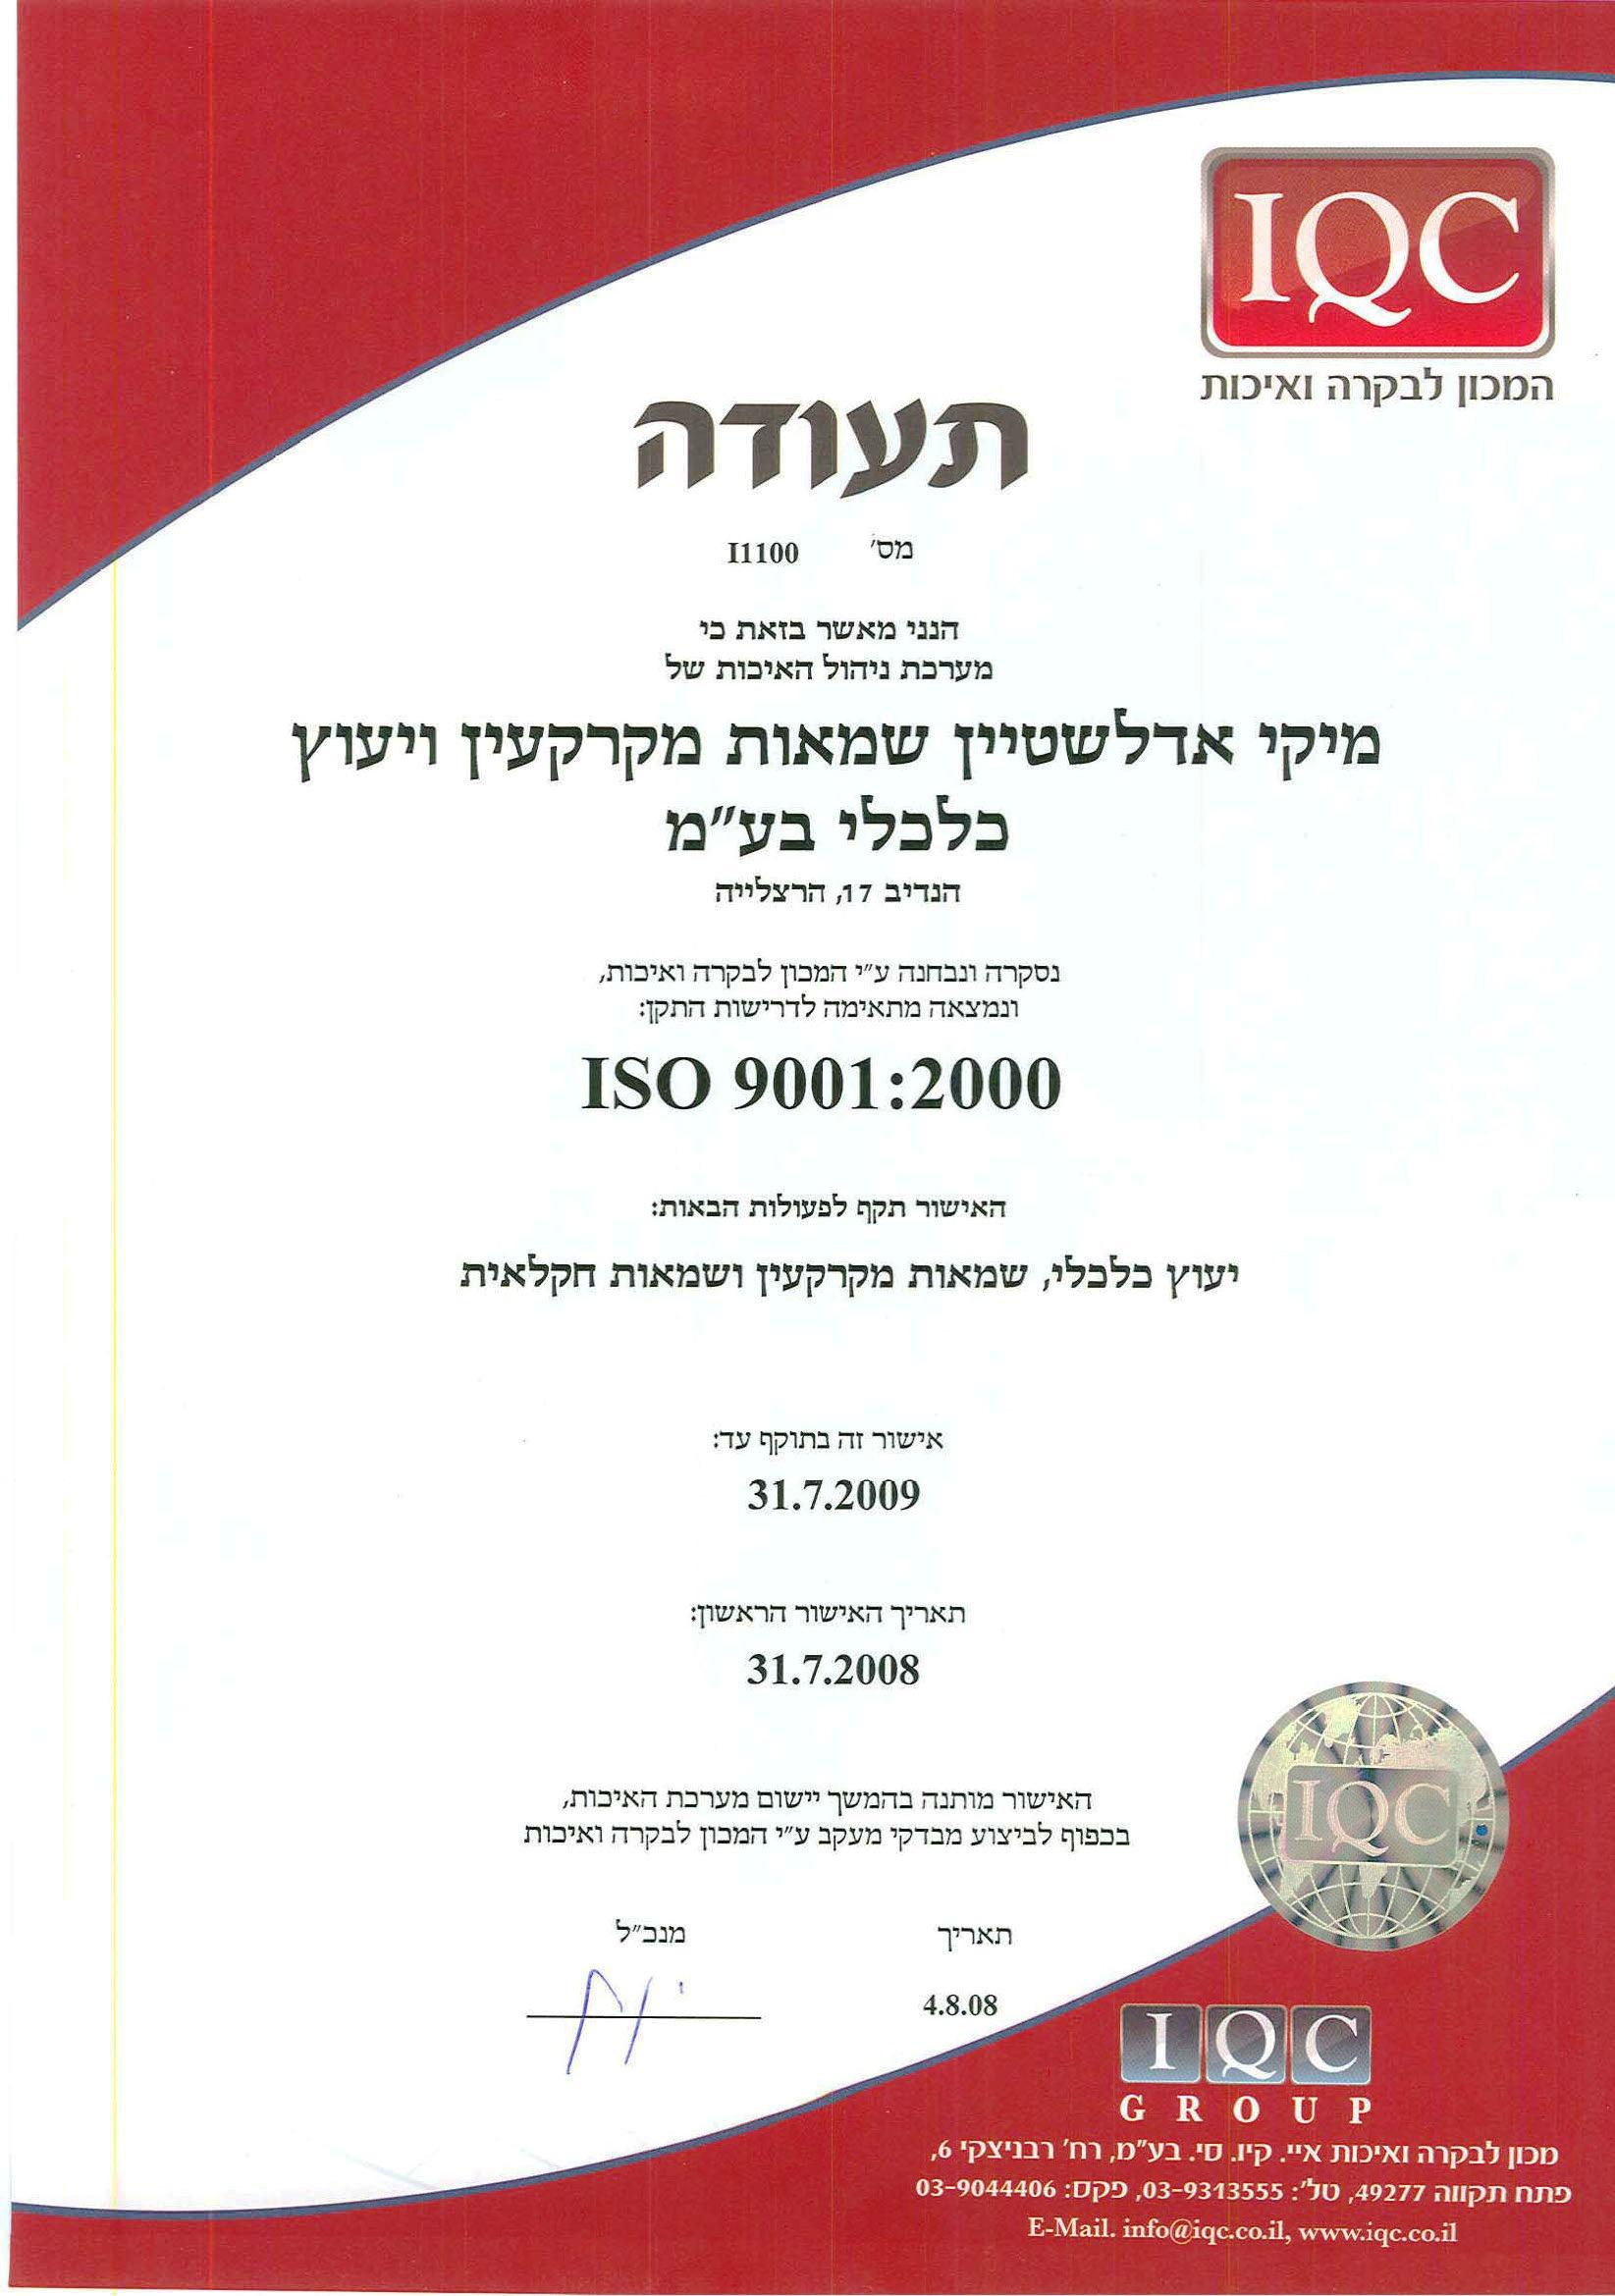 IS0 9001:2000